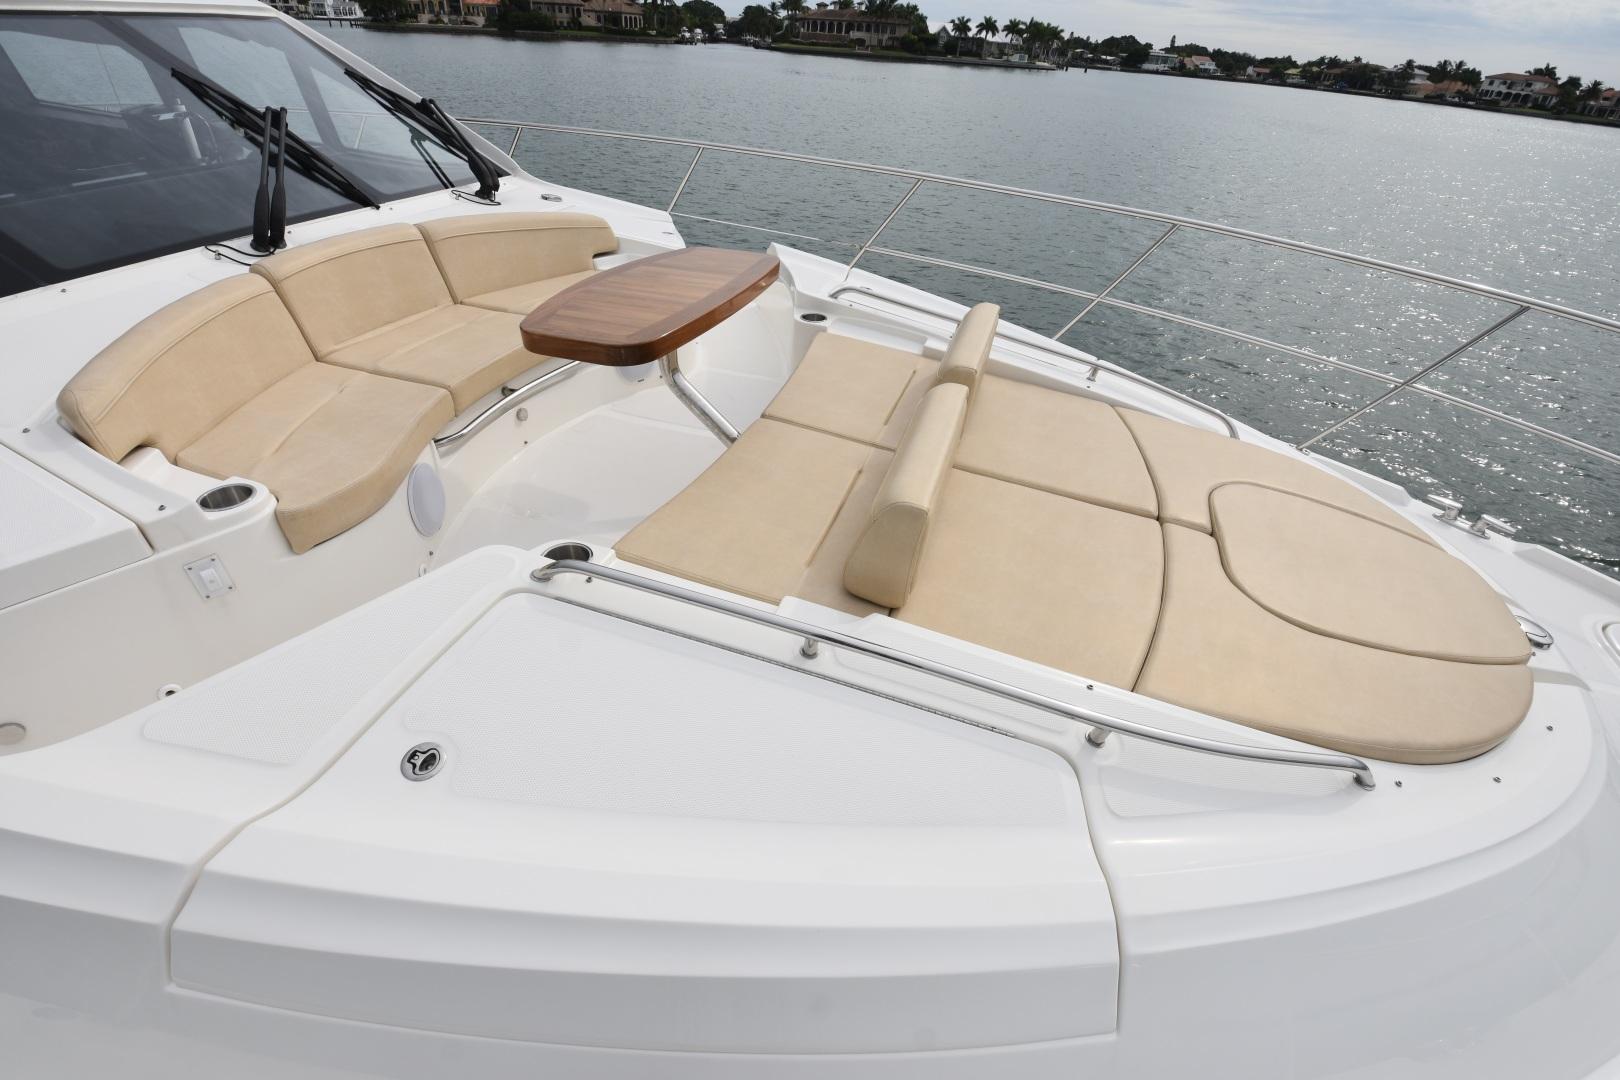 Sea Ray-L650 2016-3x's the Charm Longboat Key-Florida-United States-2016 Sea Ray L650  3x's the Charm  Bow Seating-1251861 | Thumbnail